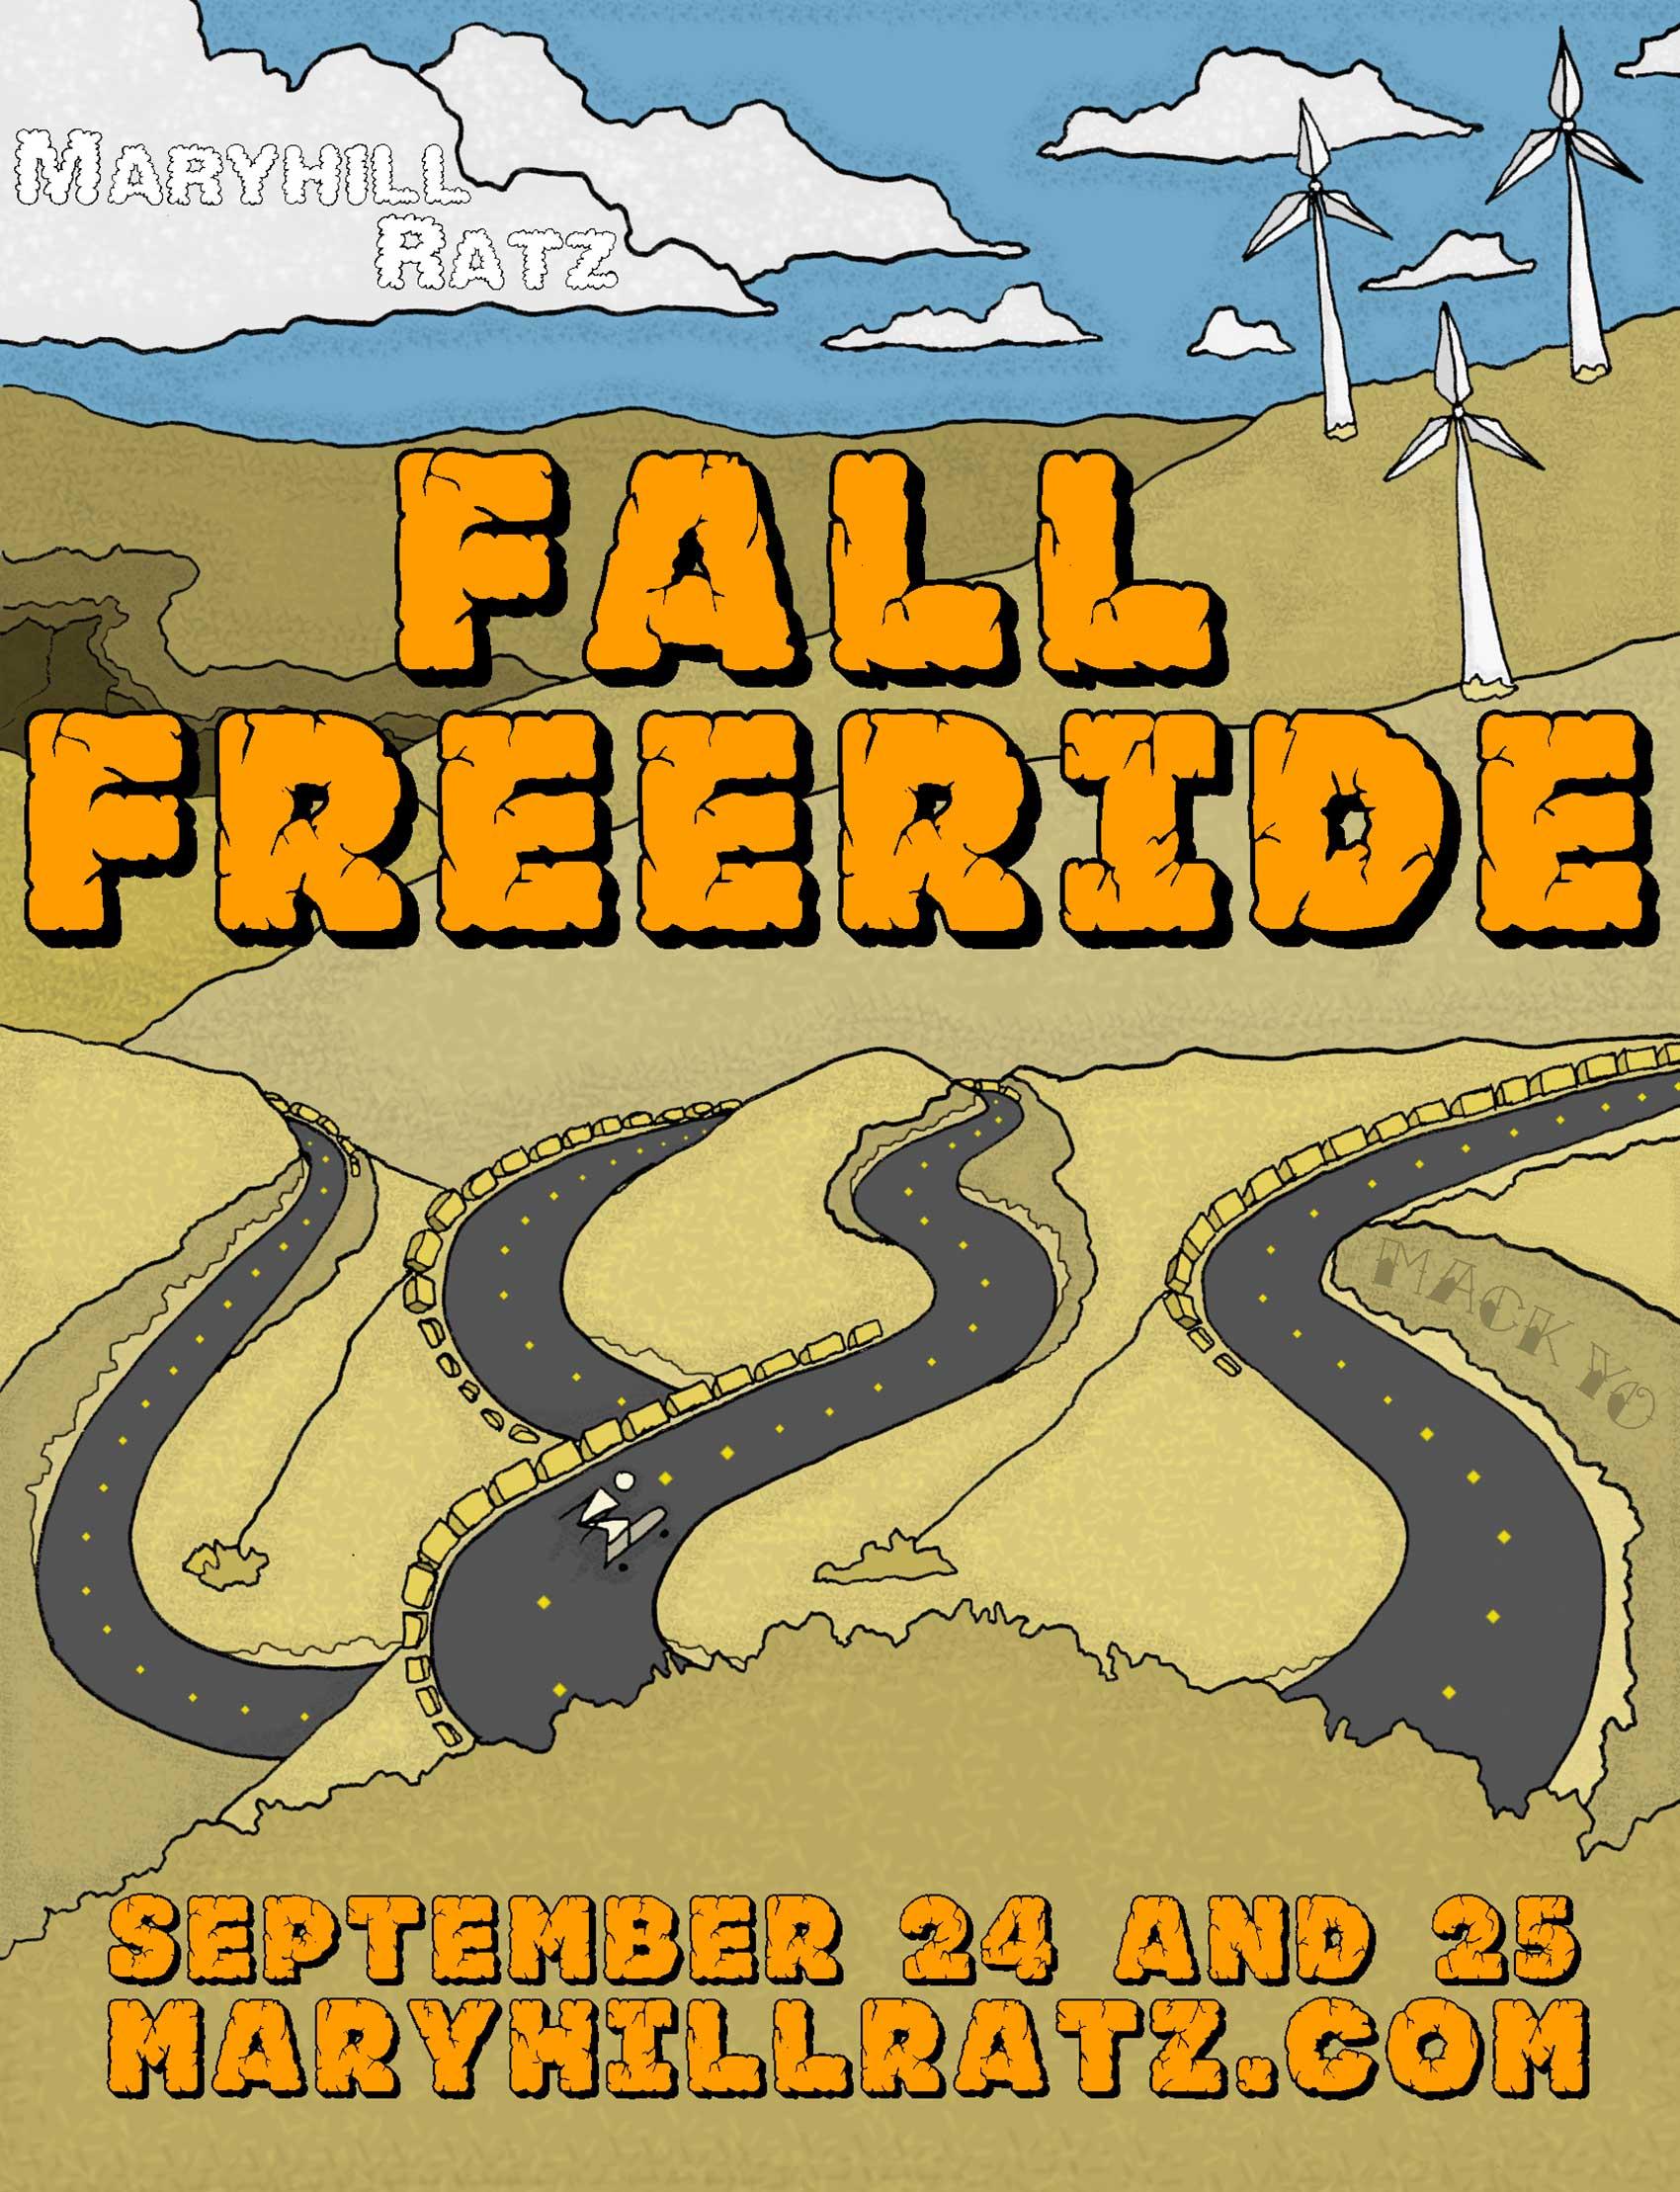 2016 Fall FREE-4-ALL